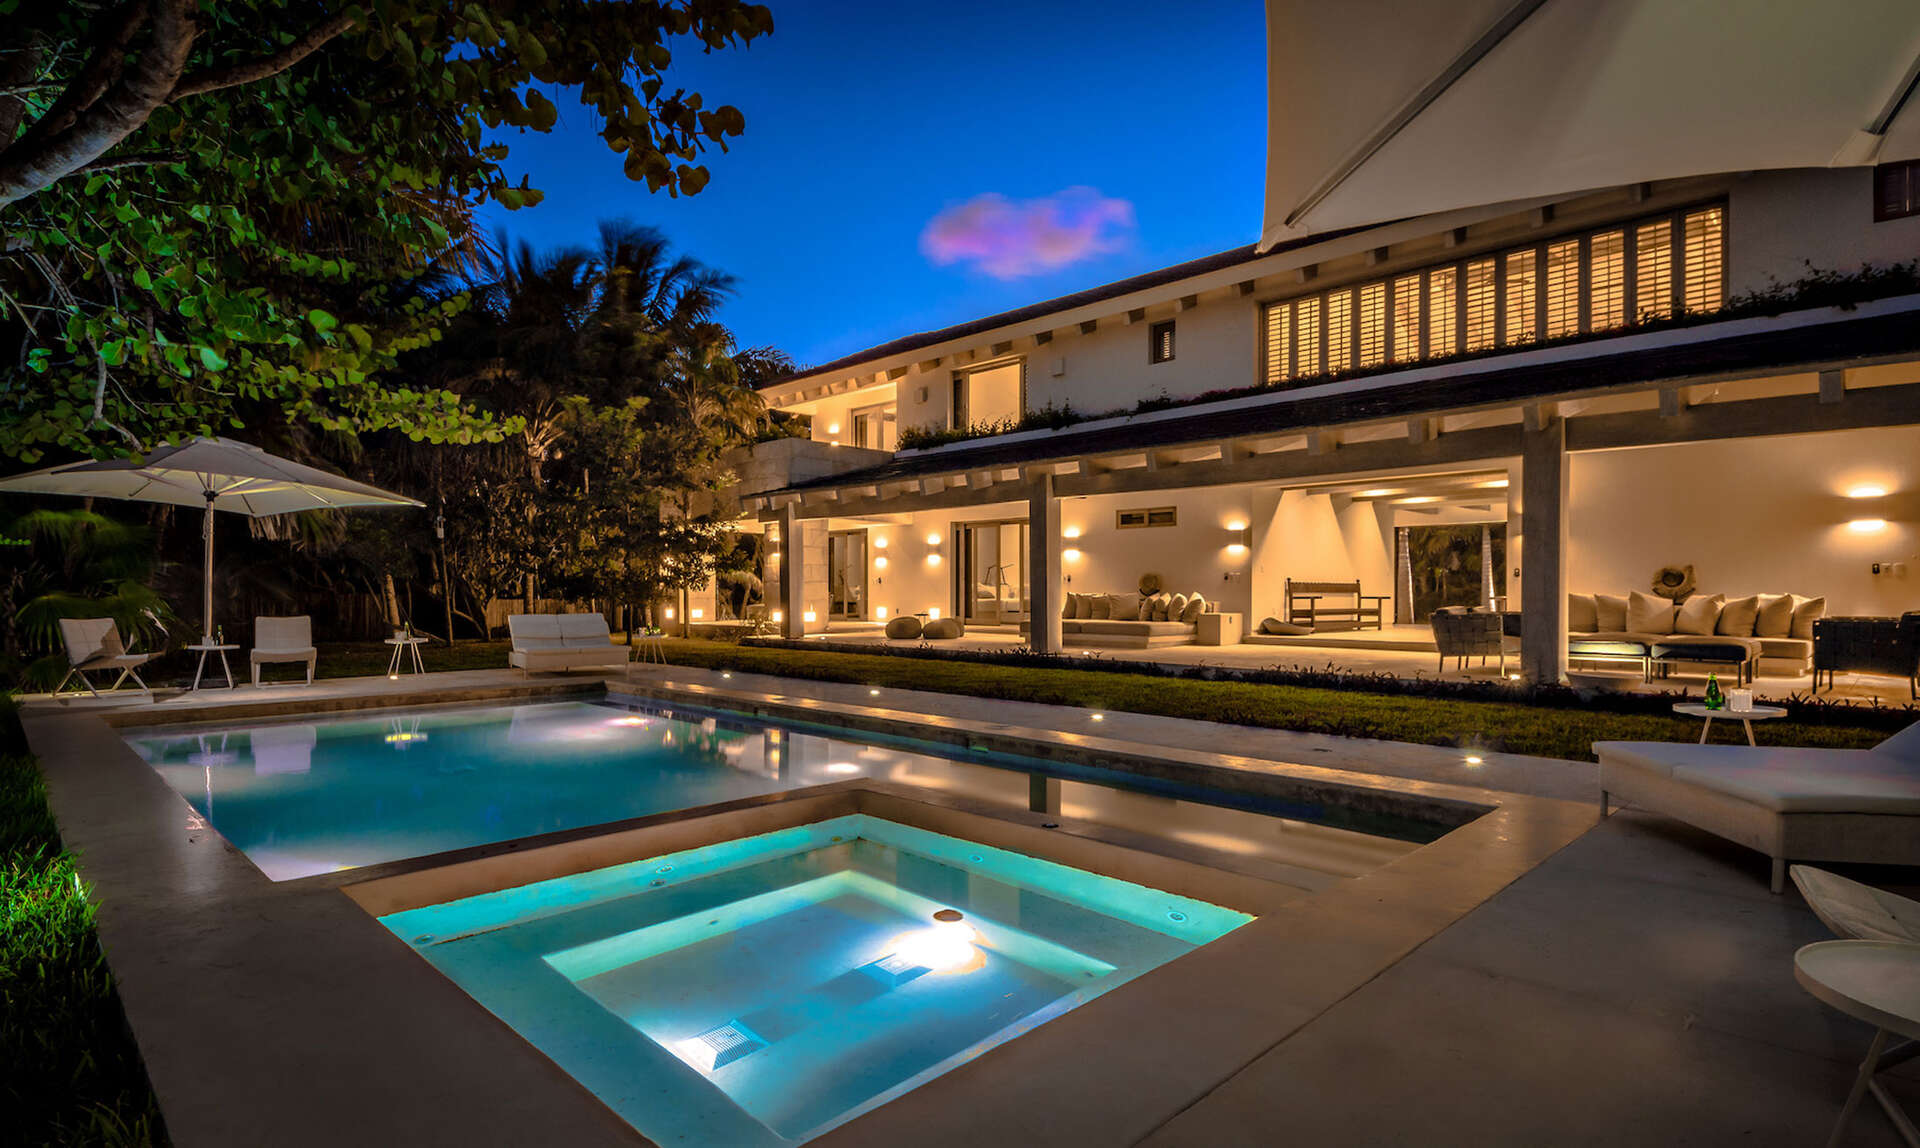 Luxury vacation rentals mexico - Riviera maya - Sian ka an - No location 4 - Casa Ixchel - Image 1/12